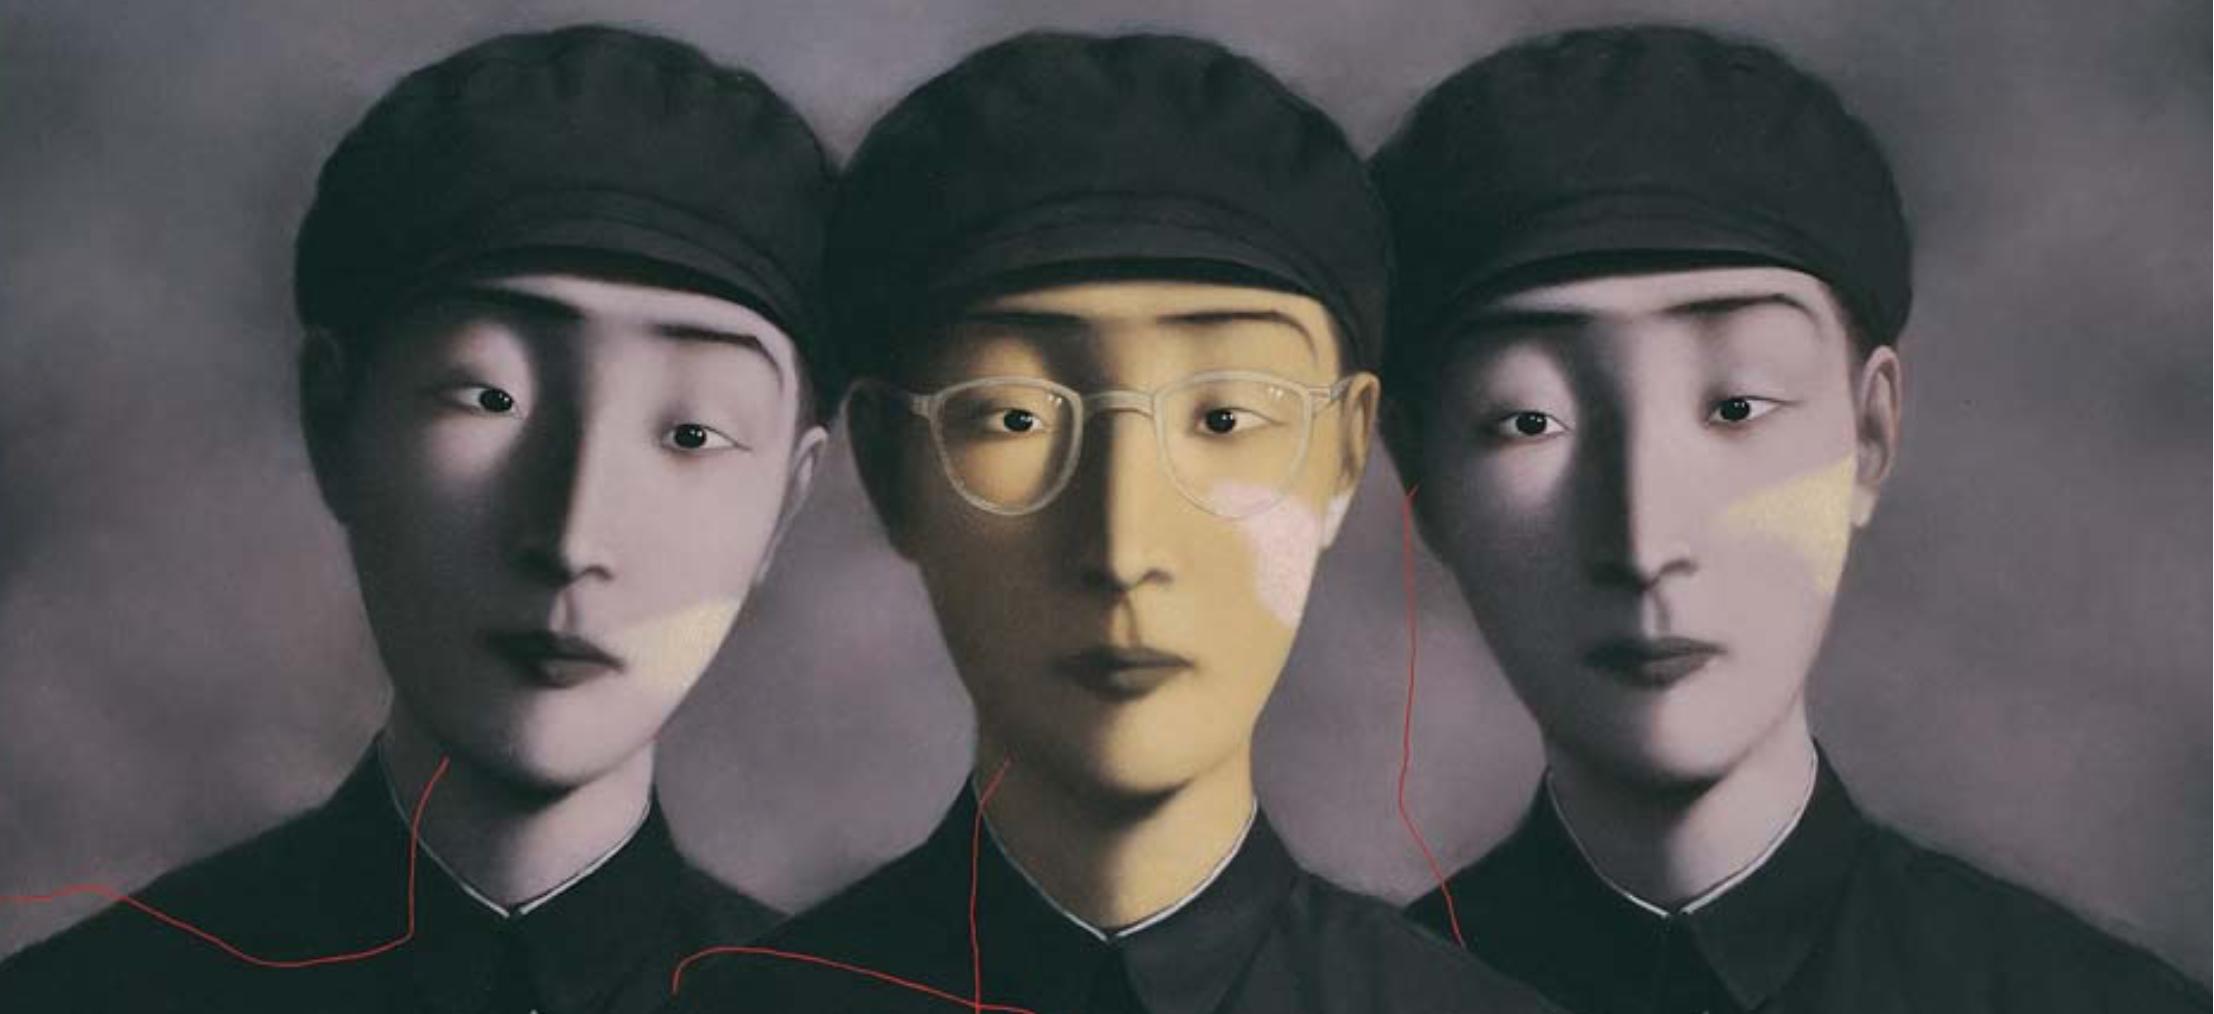 Zhang Xiaogang: Early works in Australia